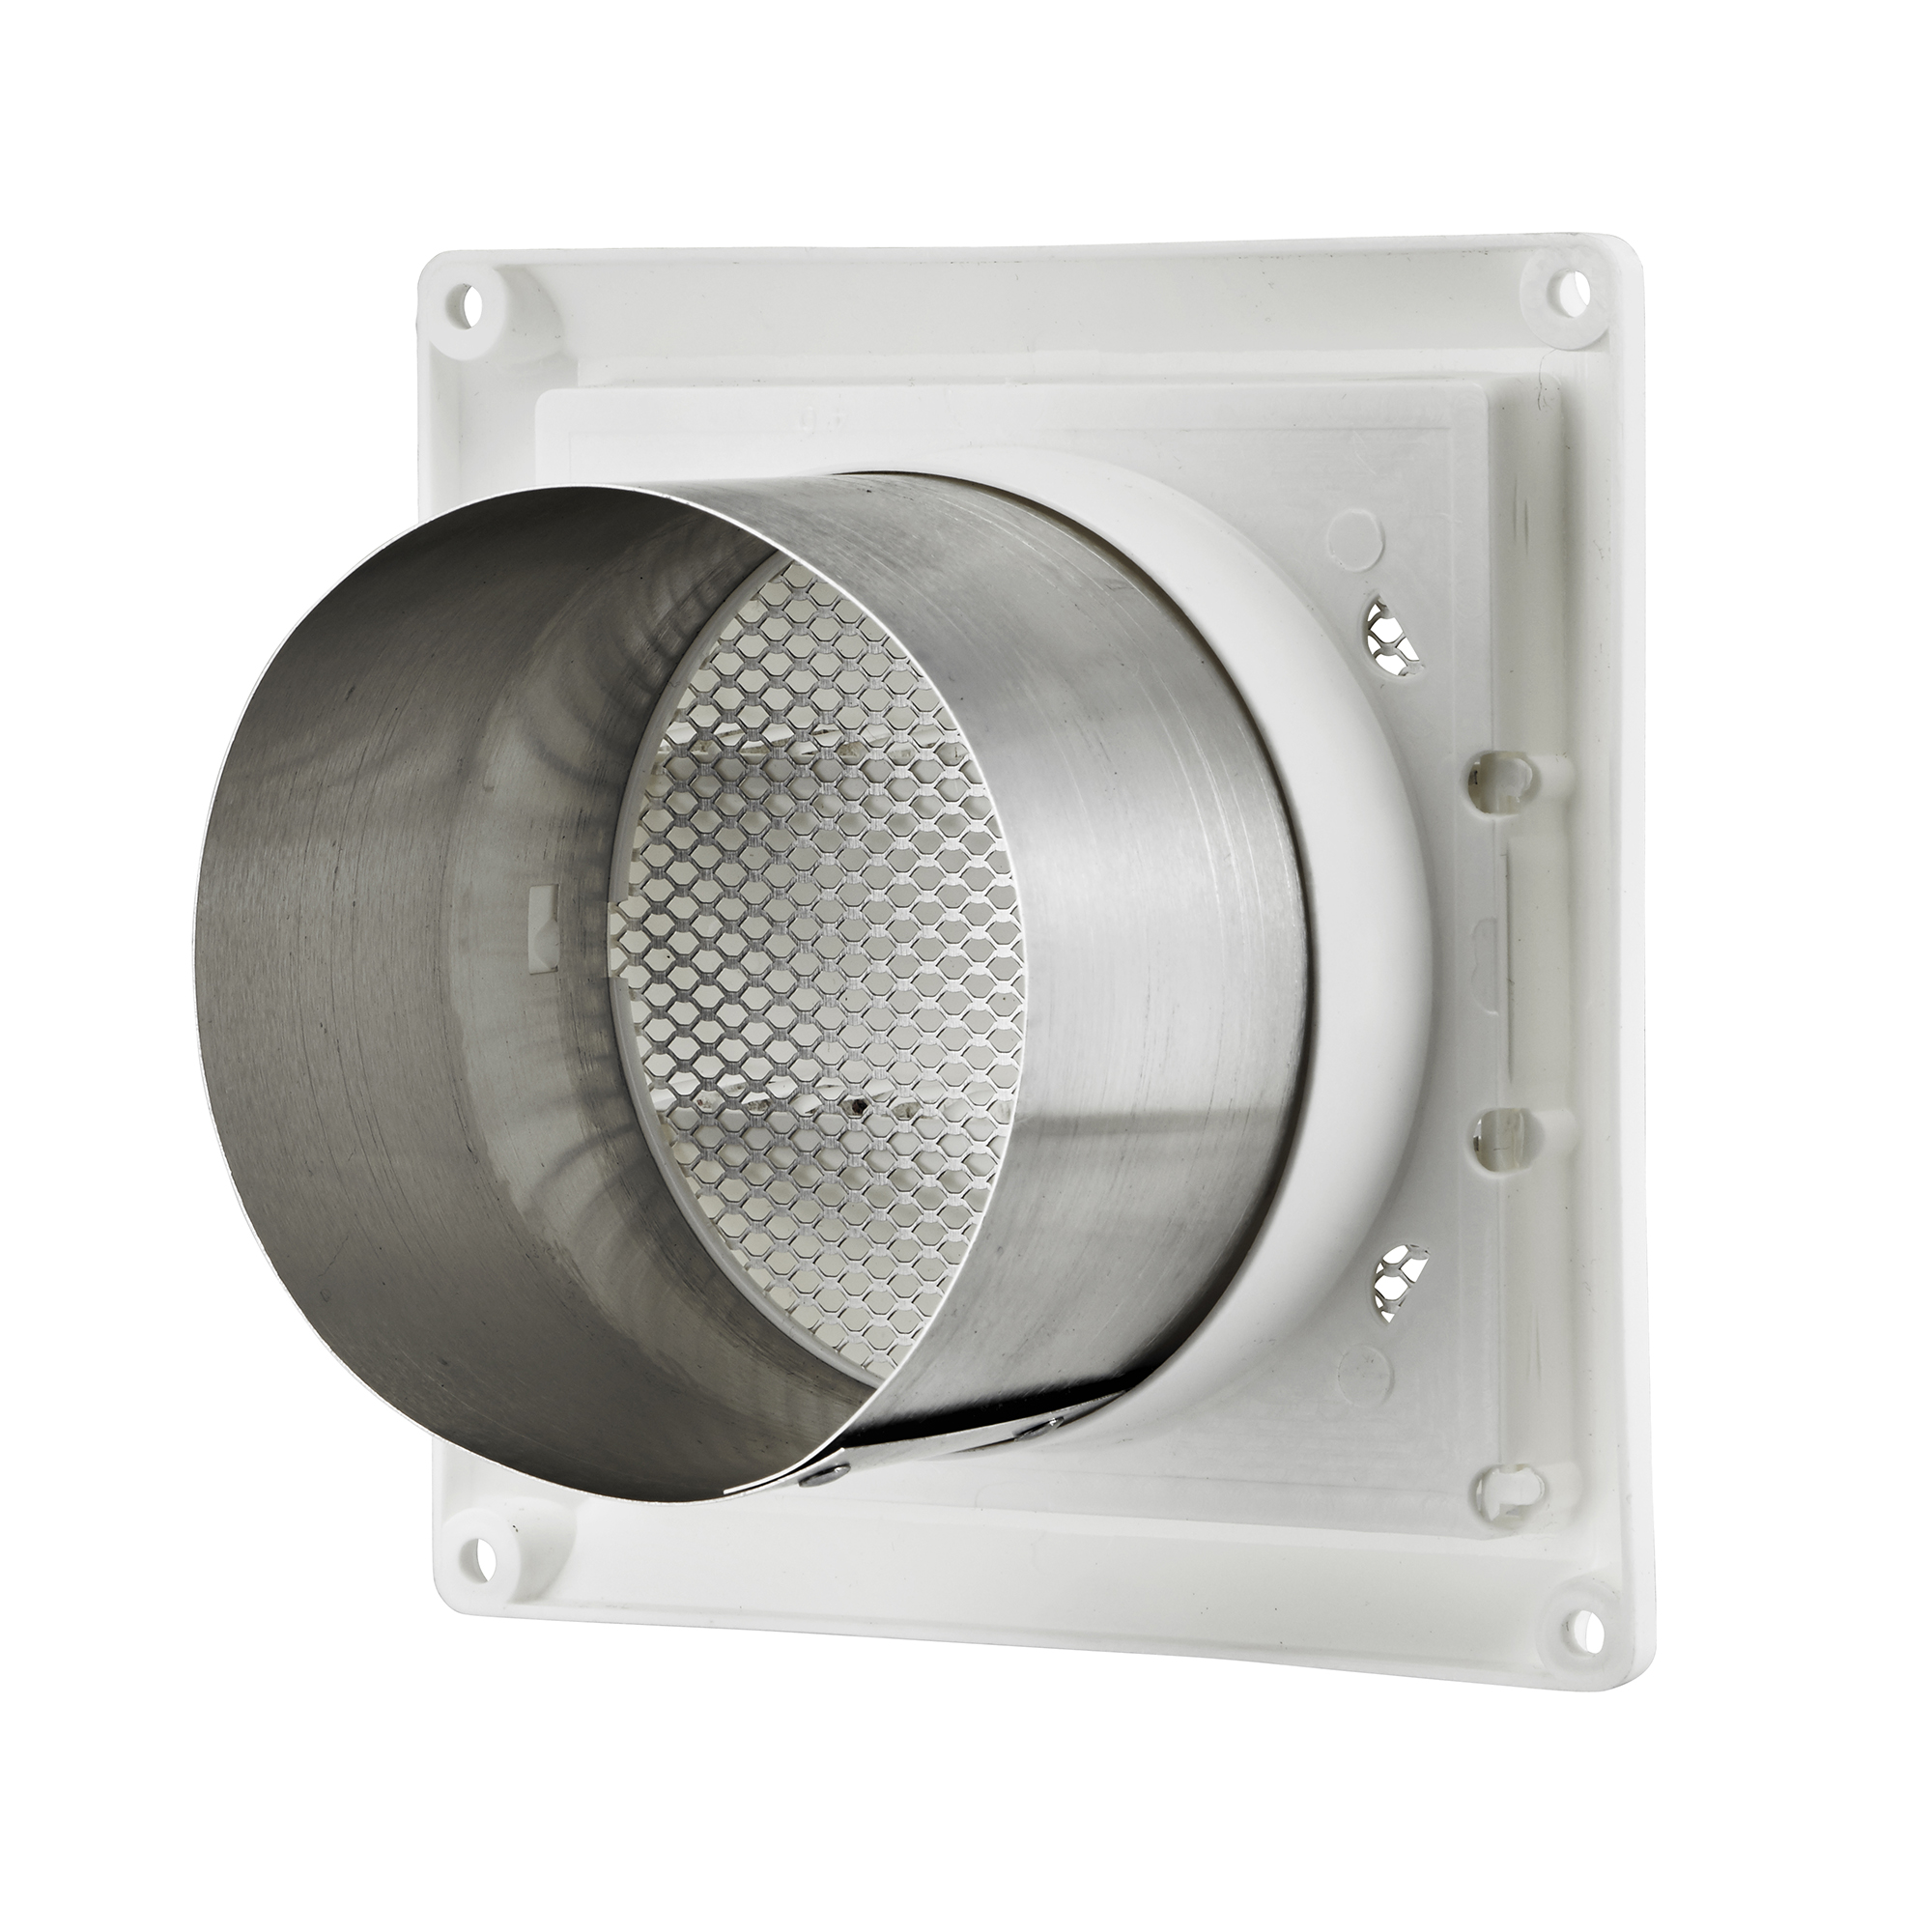 Air Intake Vent : Quot white plastic air intake louver vent gt lambro